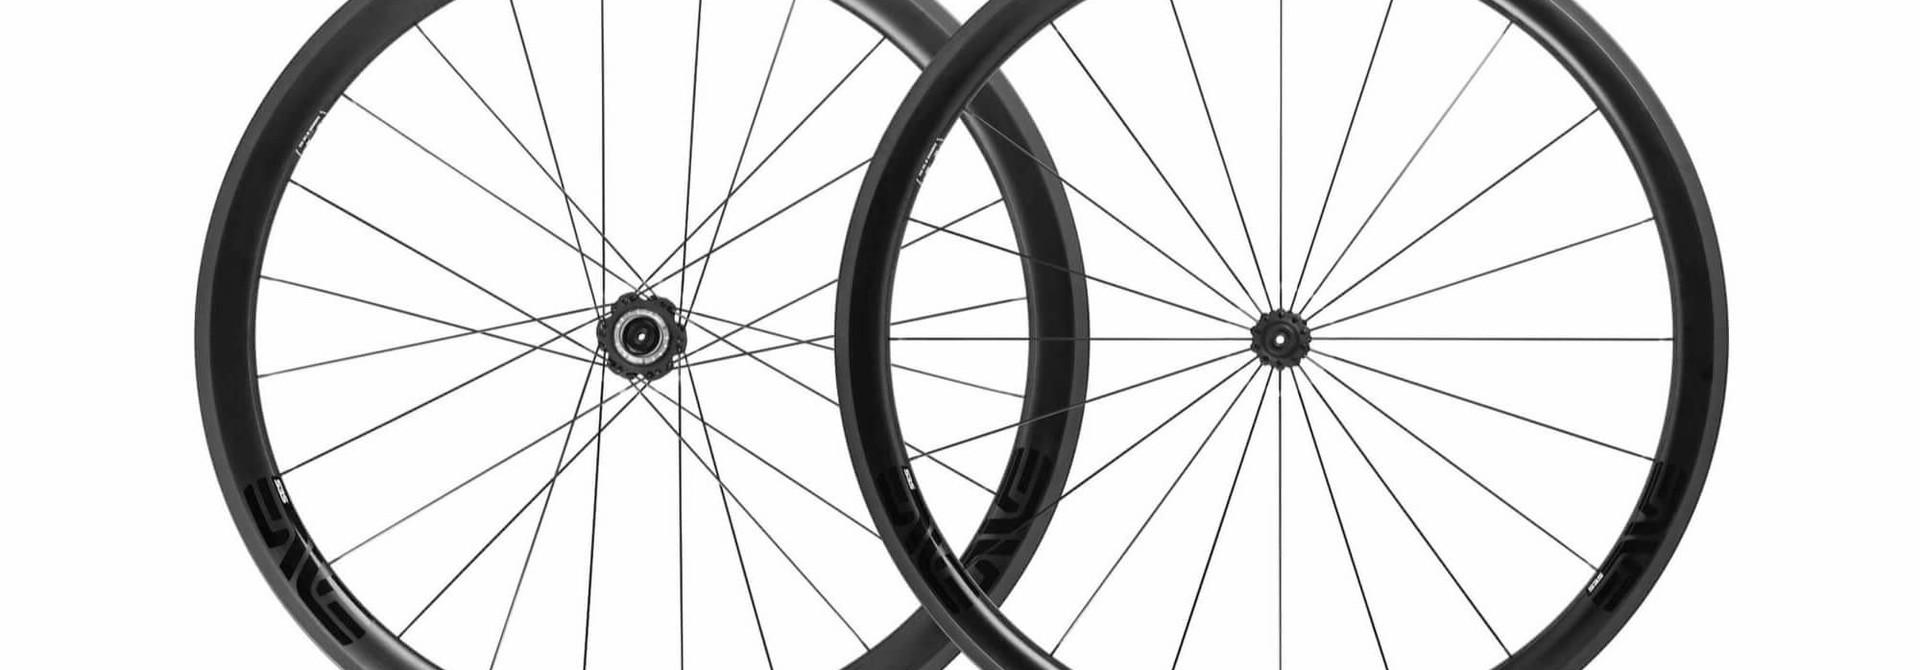 Wheelset SES 3.4C TL